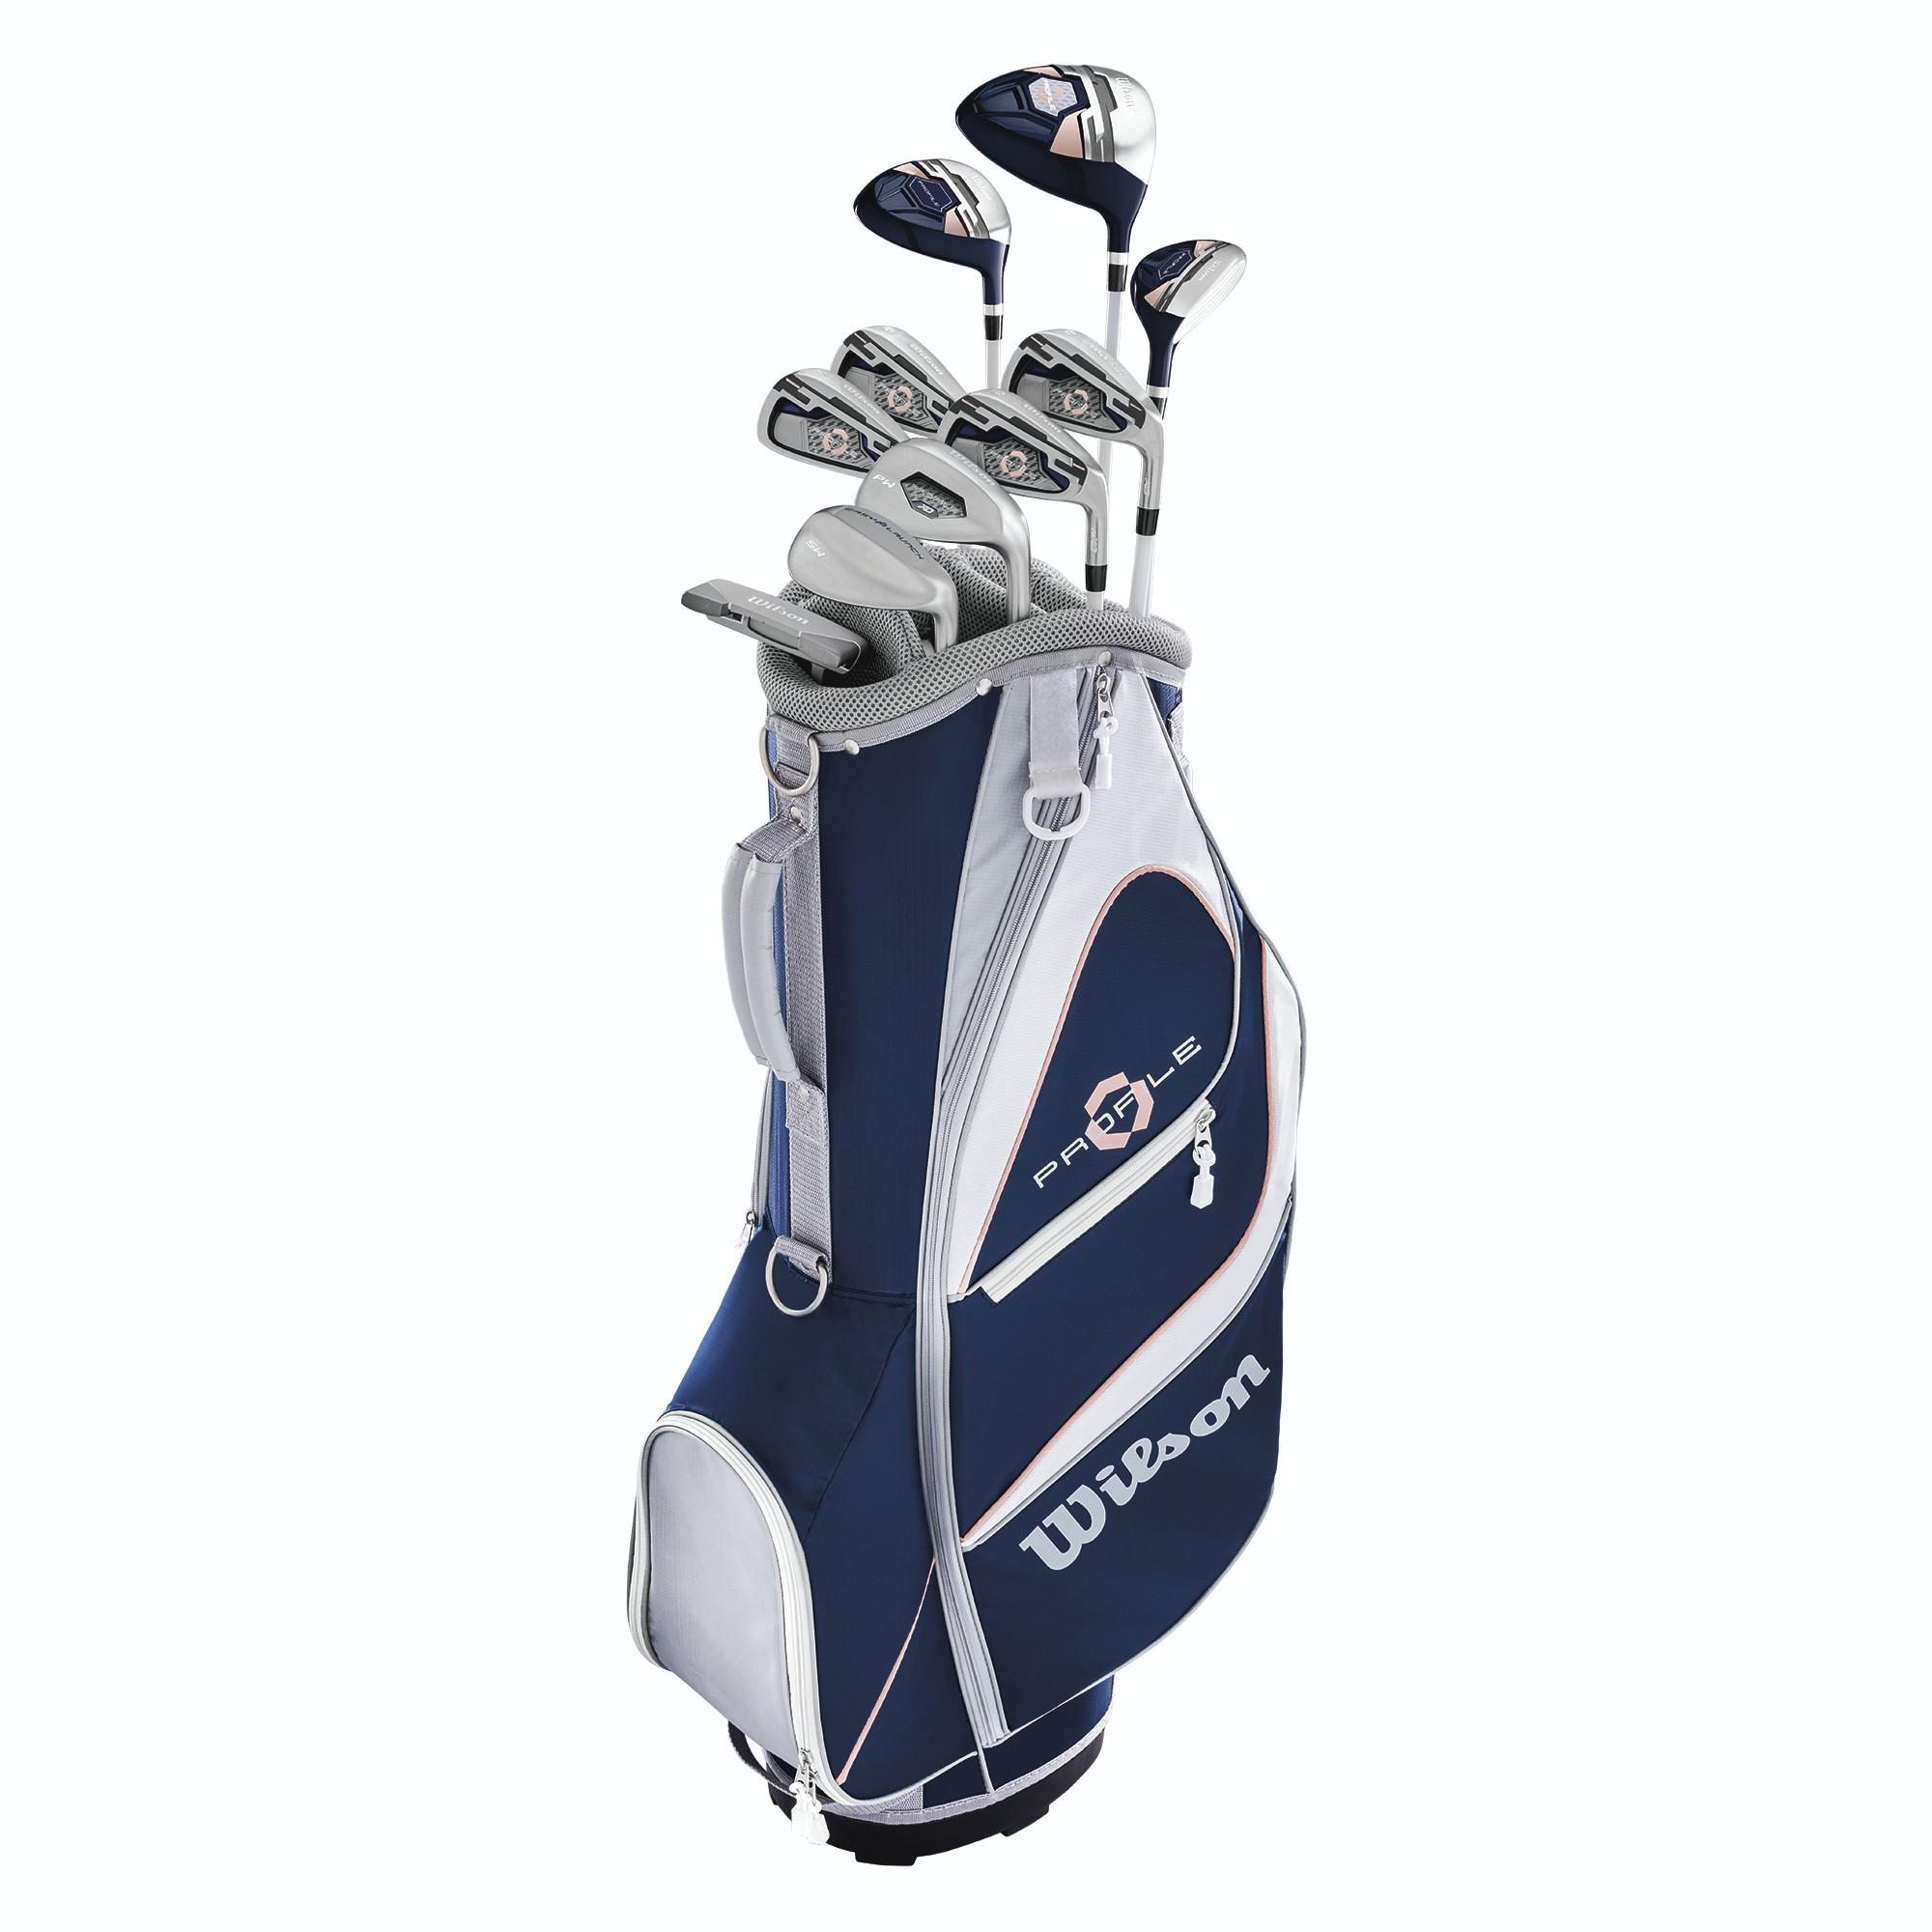 Wilson Profile Xd Women S Complete Golf Club Set W Cart Bag Pga Tour Superstore